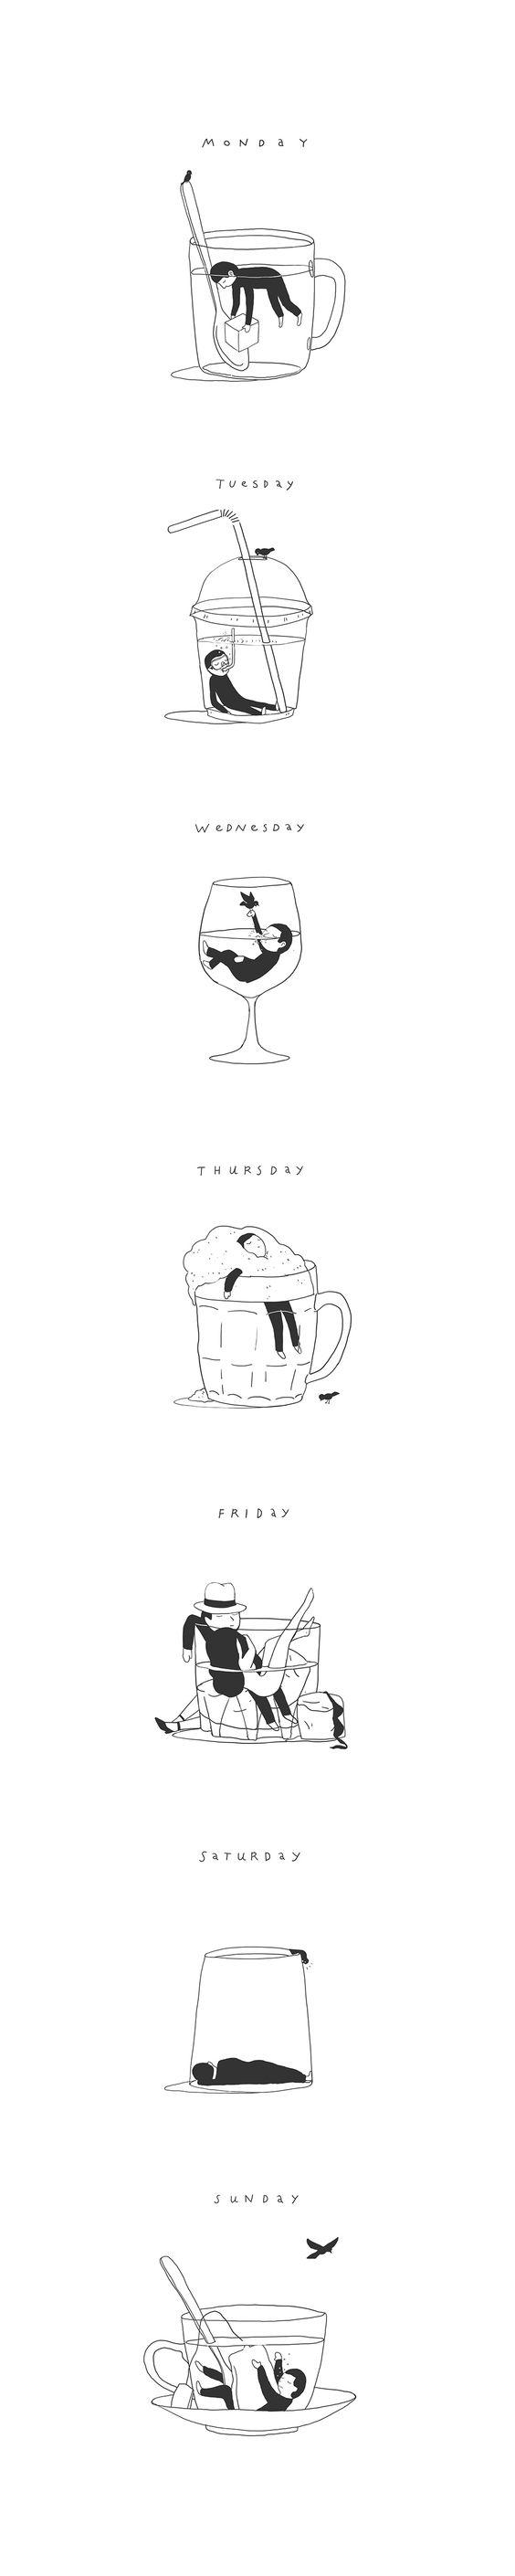 Week of sleeping cups, Иллюстрация © ИльяКазаков: